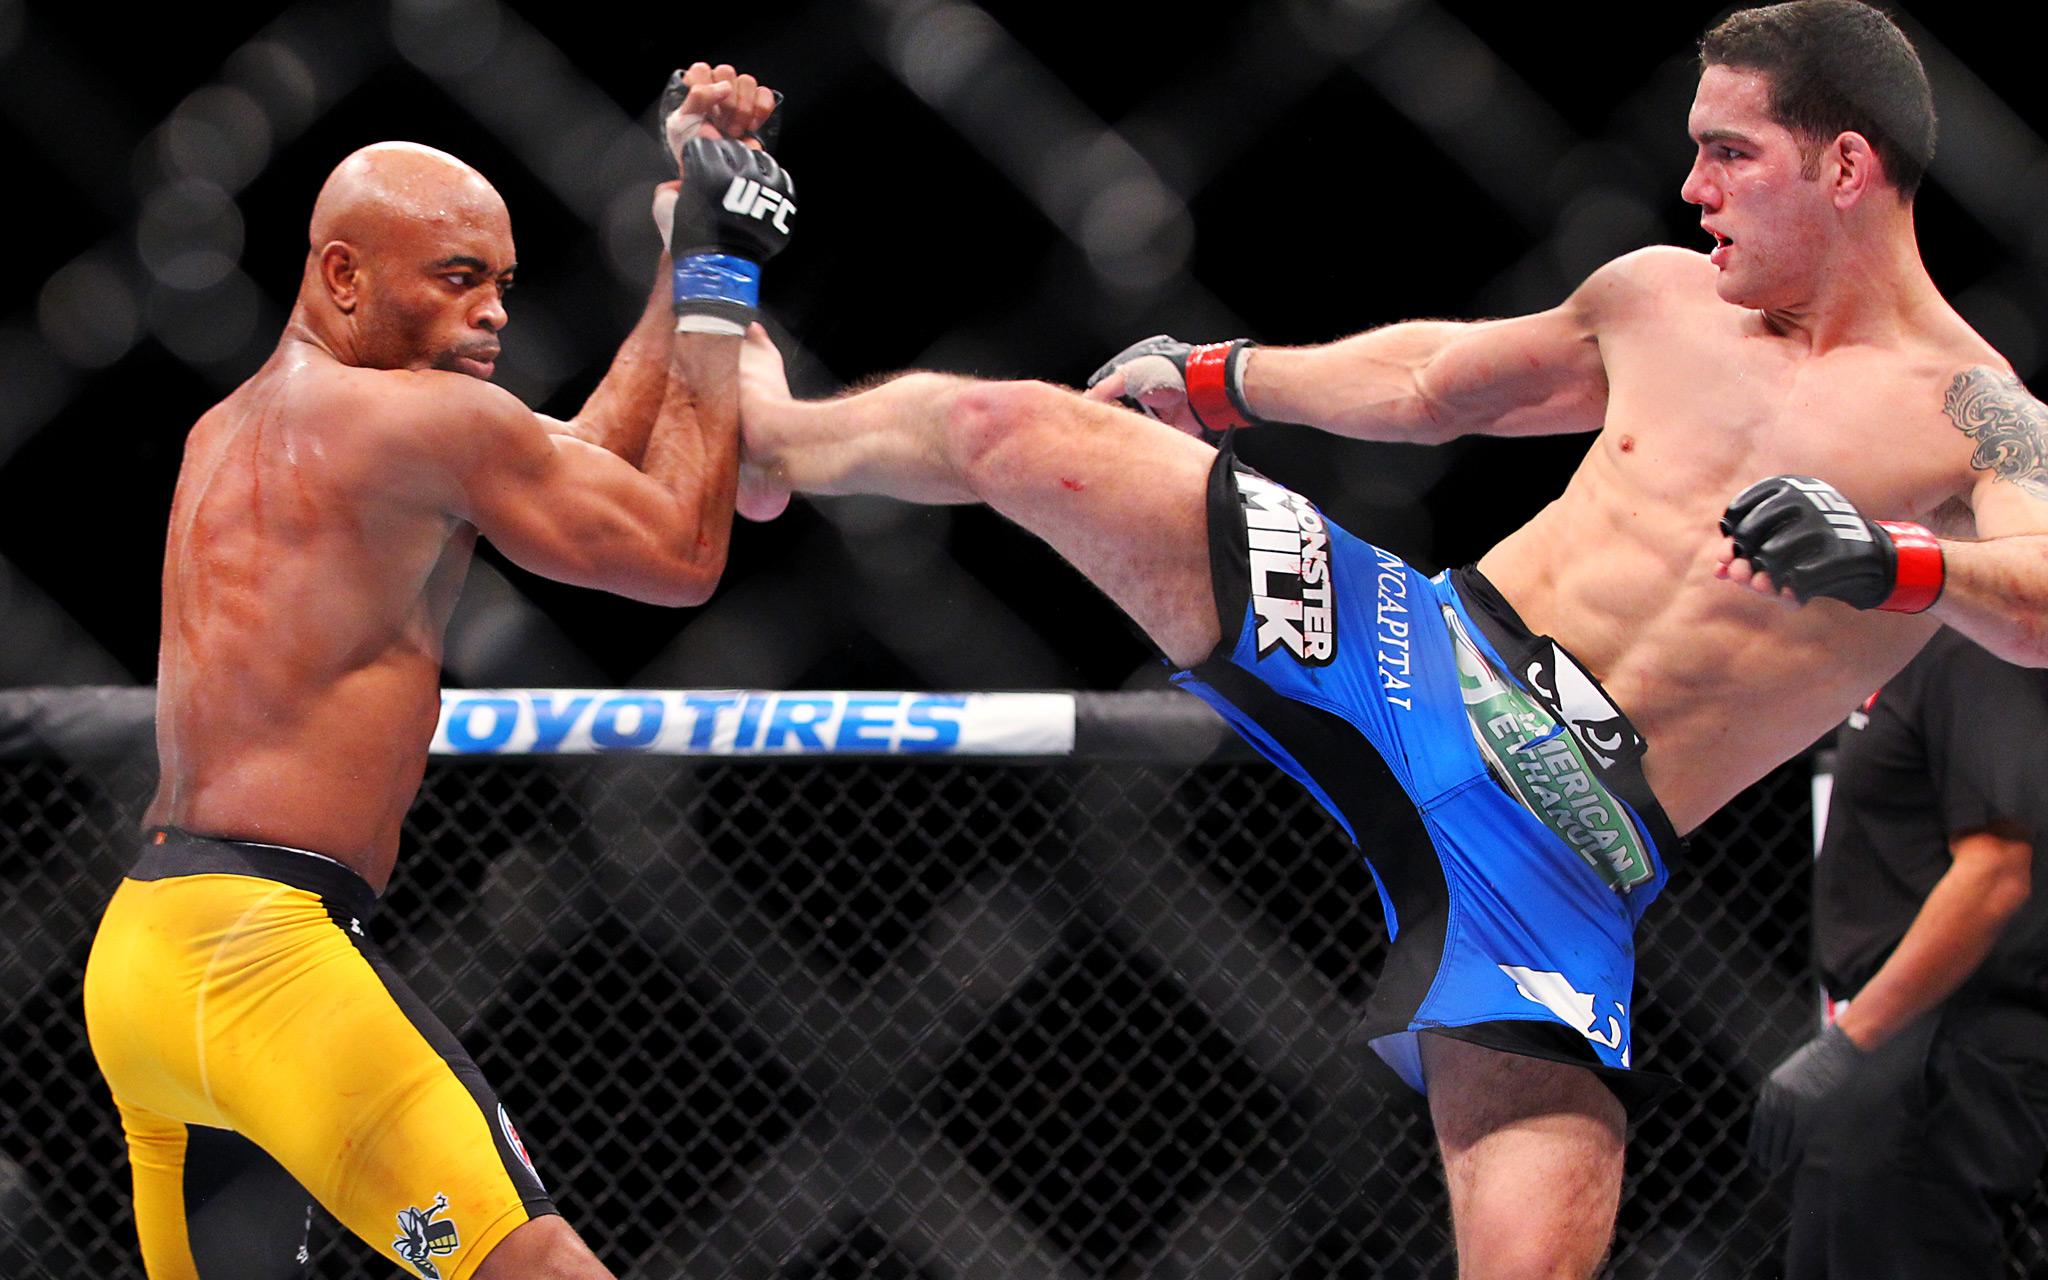 And Still ... - UFC 168 - ESPN